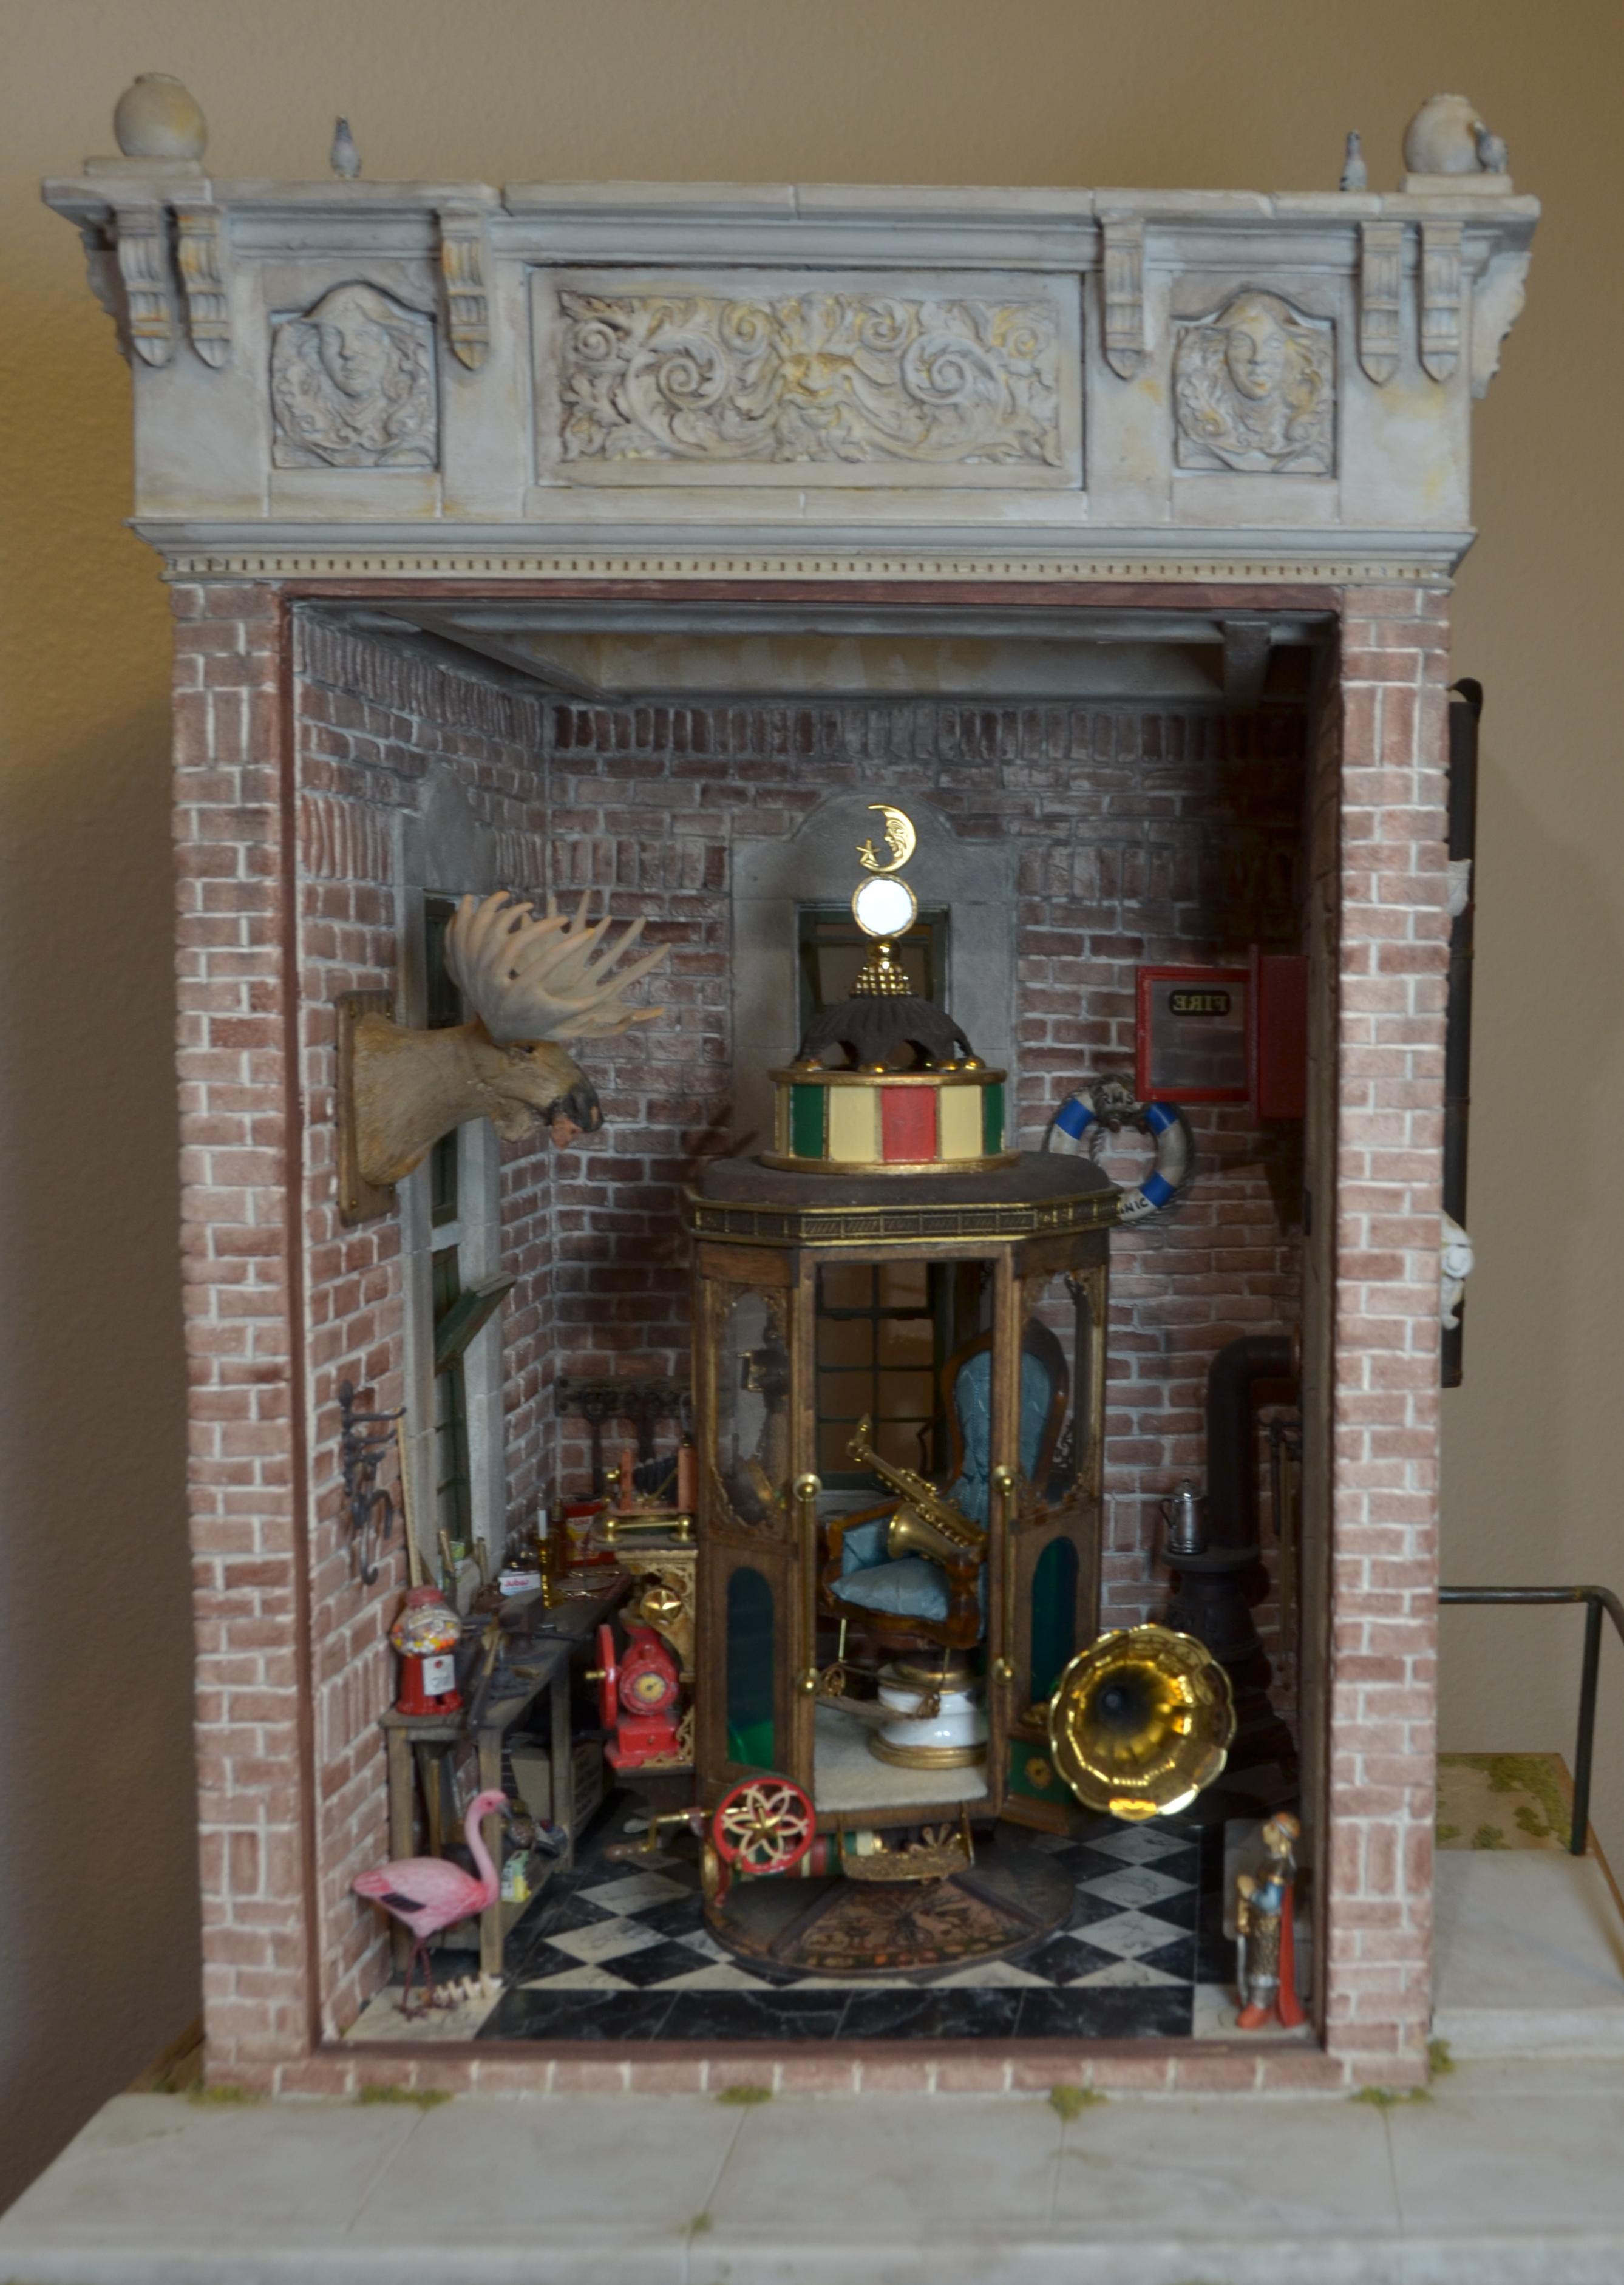 Toadwart's Dreamscope